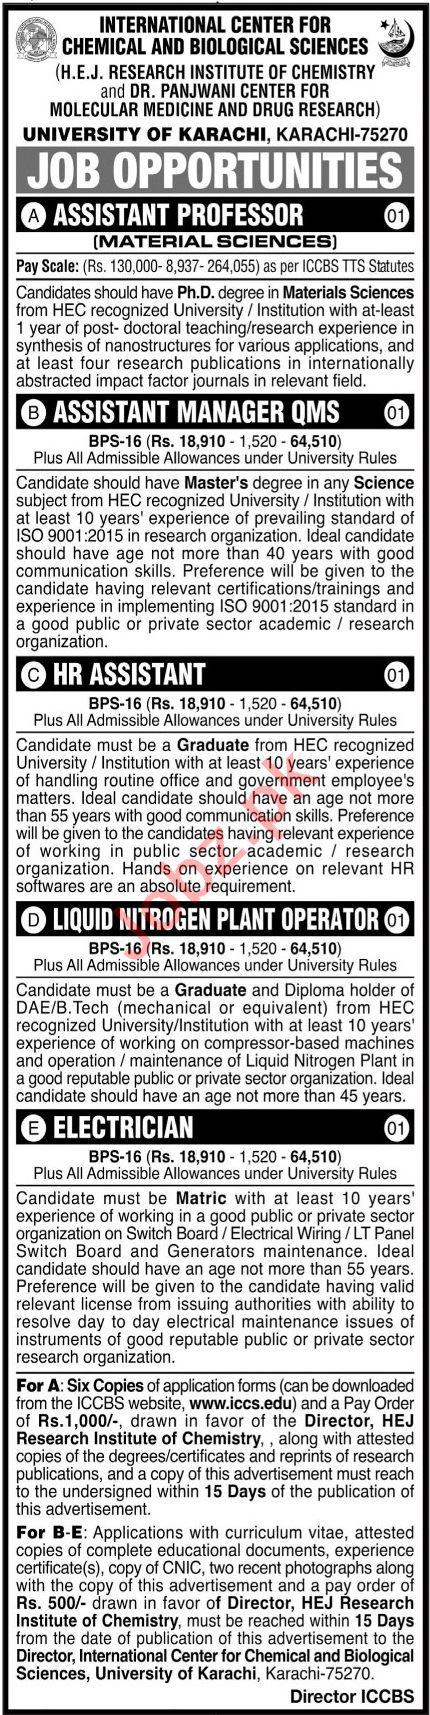 HEJ Research Institute of Chemistry Karachi Jobs 2021